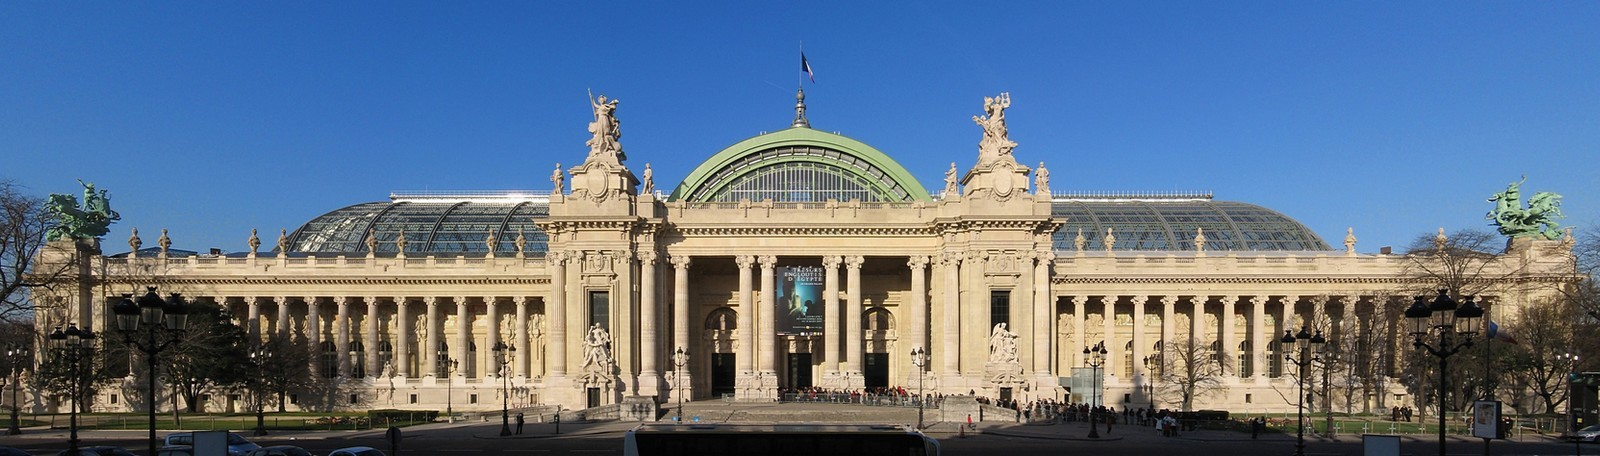 Car Park Paris Grand Palais